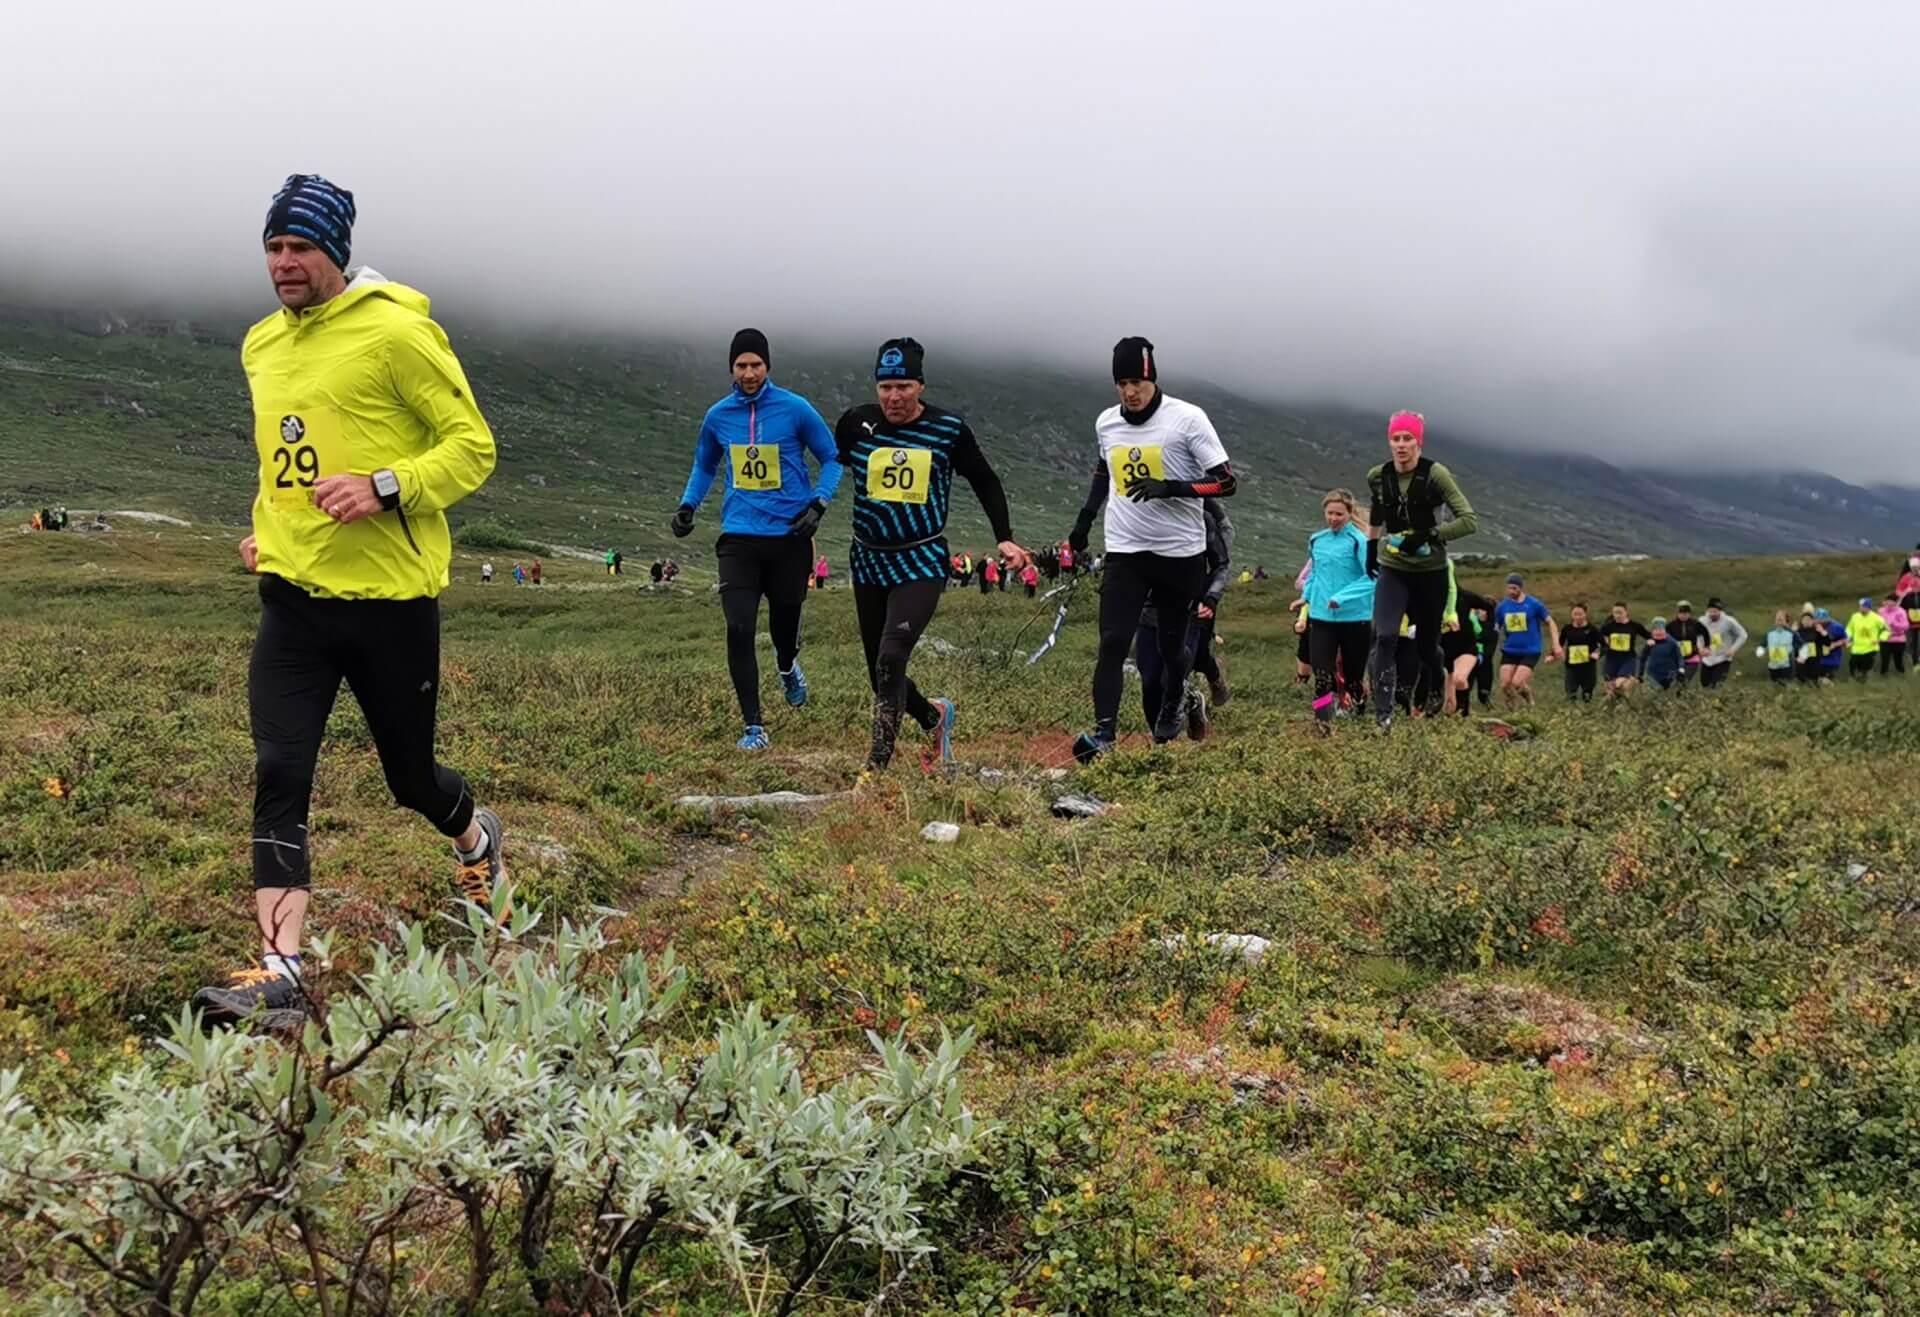 Arctic Circle Race 2019 Polcirkelloppet Guijaure start nr 29